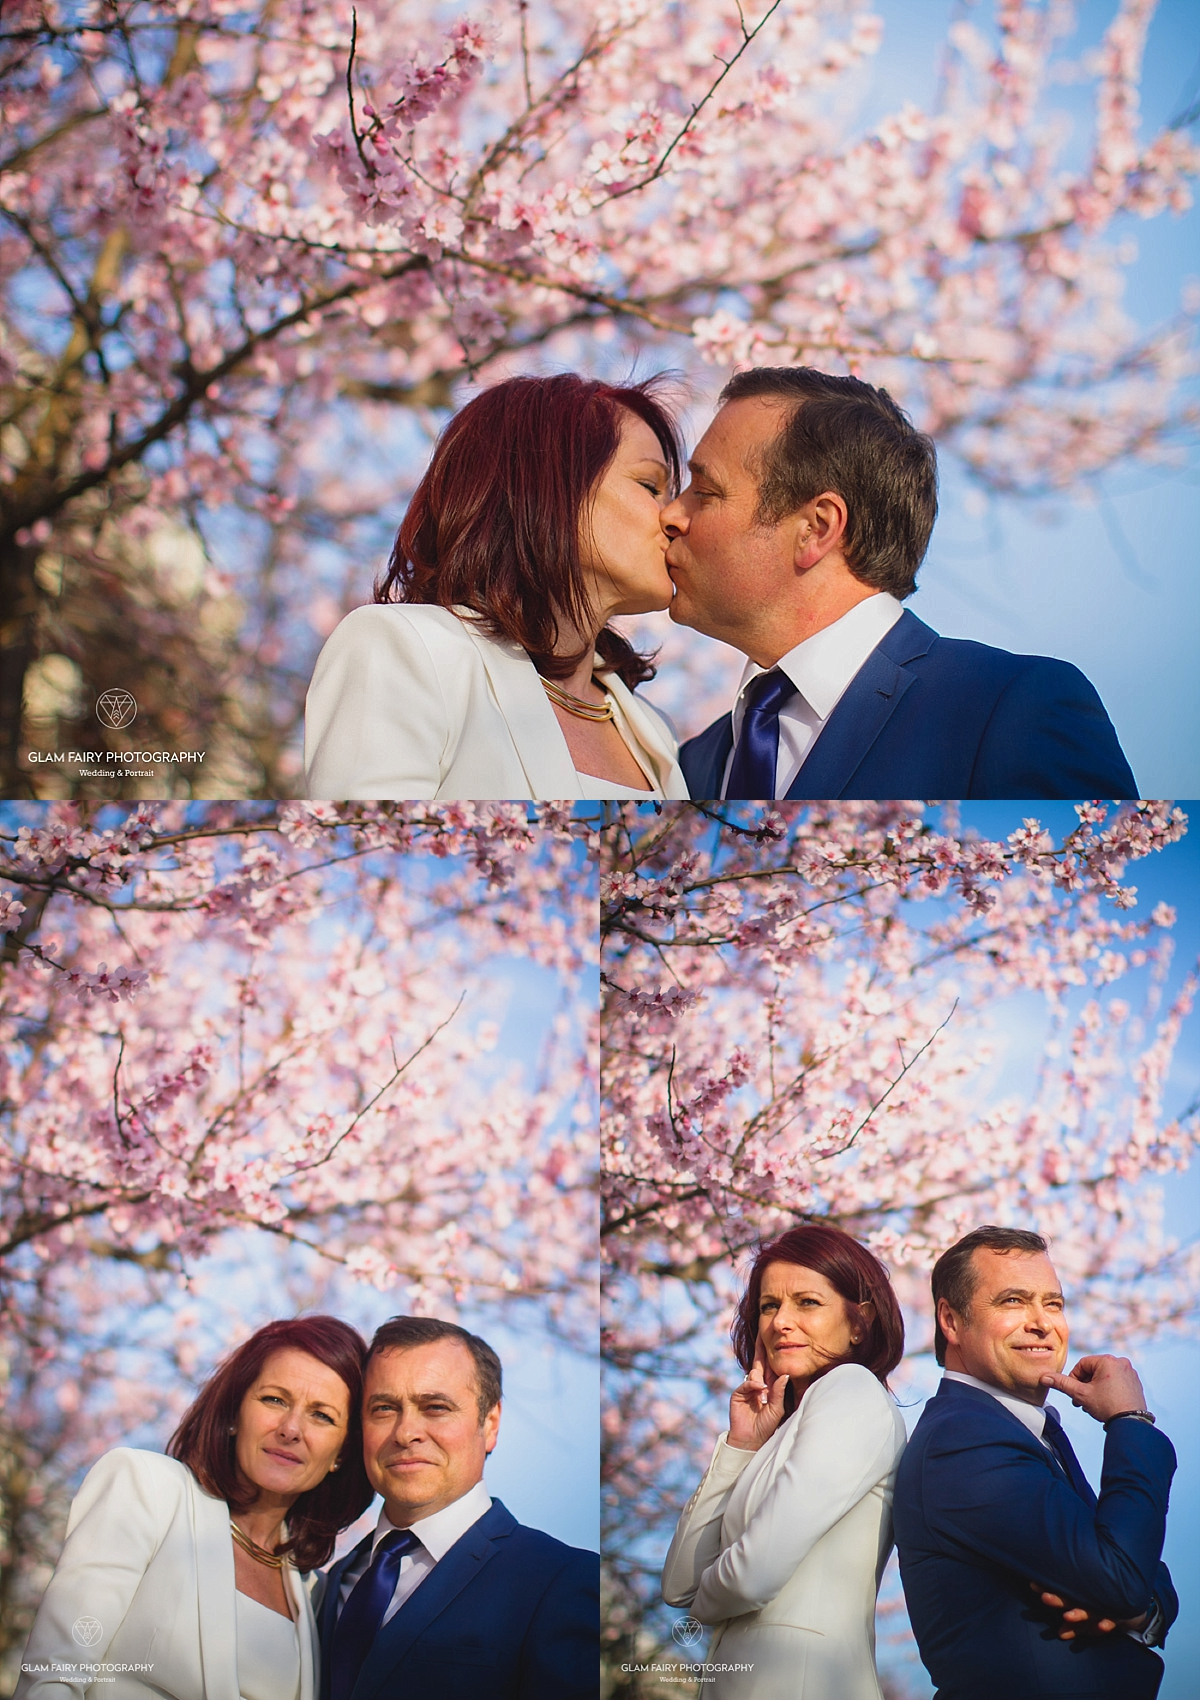 GlamFairyPhotography-mariage-civil-vincennes-patricia_0024